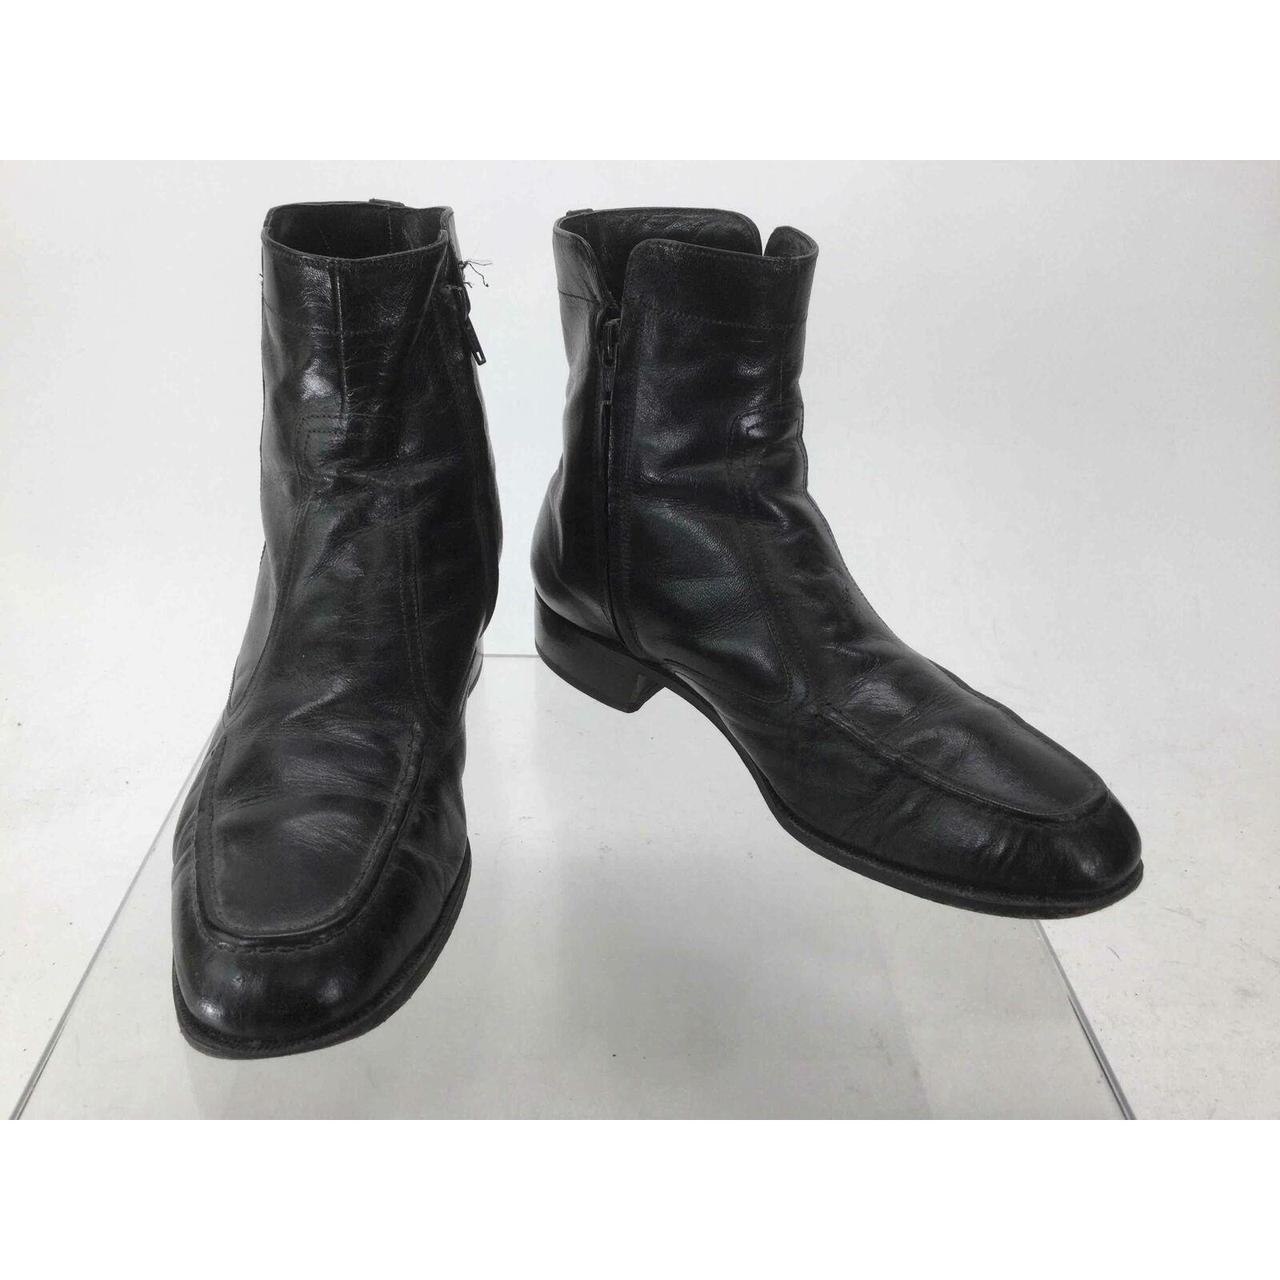 Product Image 1 - Florsheim Black Leather Zip Dress